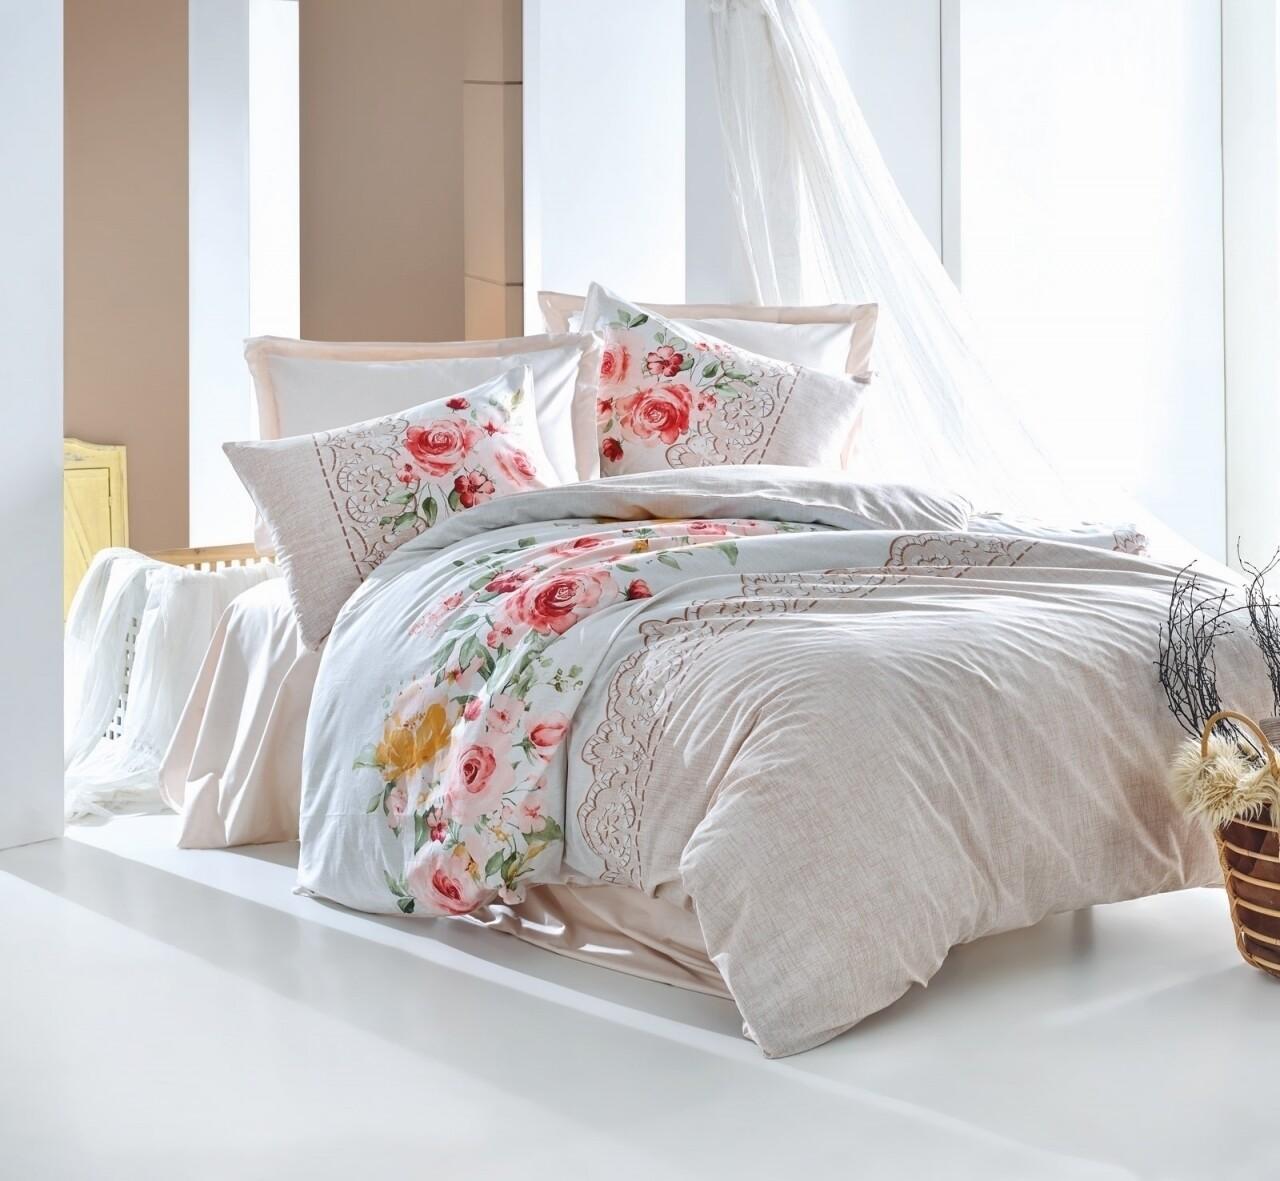 Lenjerie de pat pentru o persoana, 3 piese, 100% bumbac ranforce, Cotton Box, Sandy